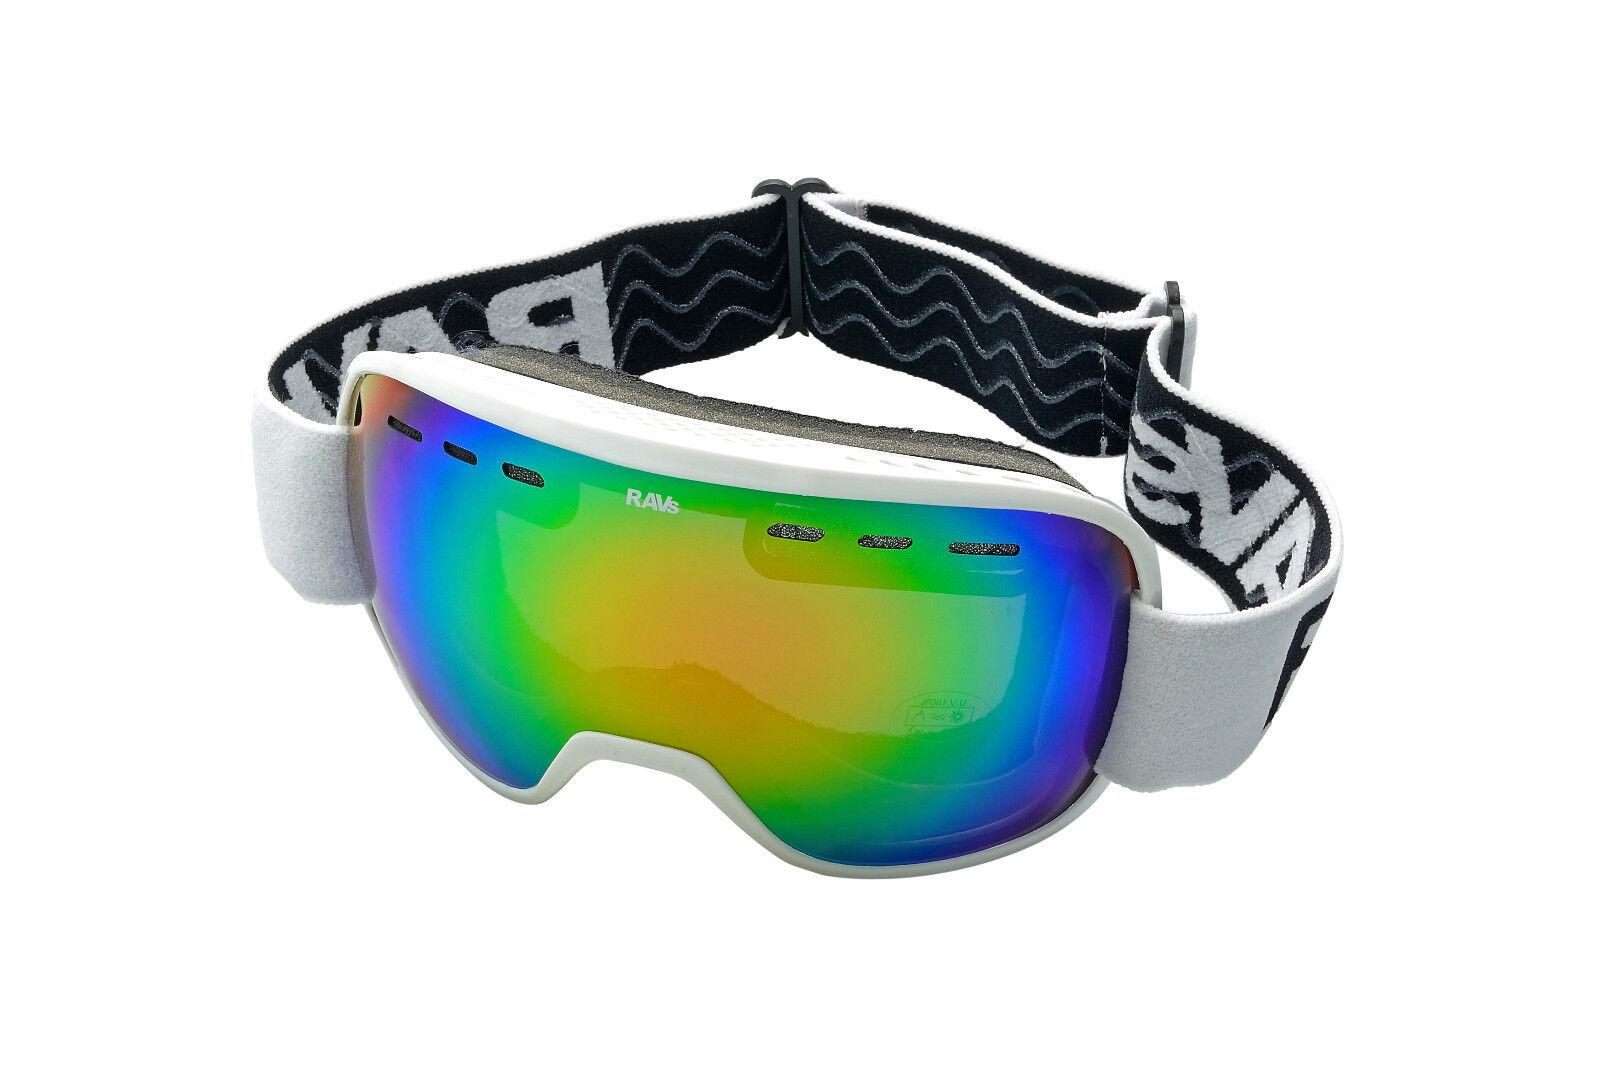 RAVS Predective Goggles Ski Snowboard Skiing - Contrast Enhanced